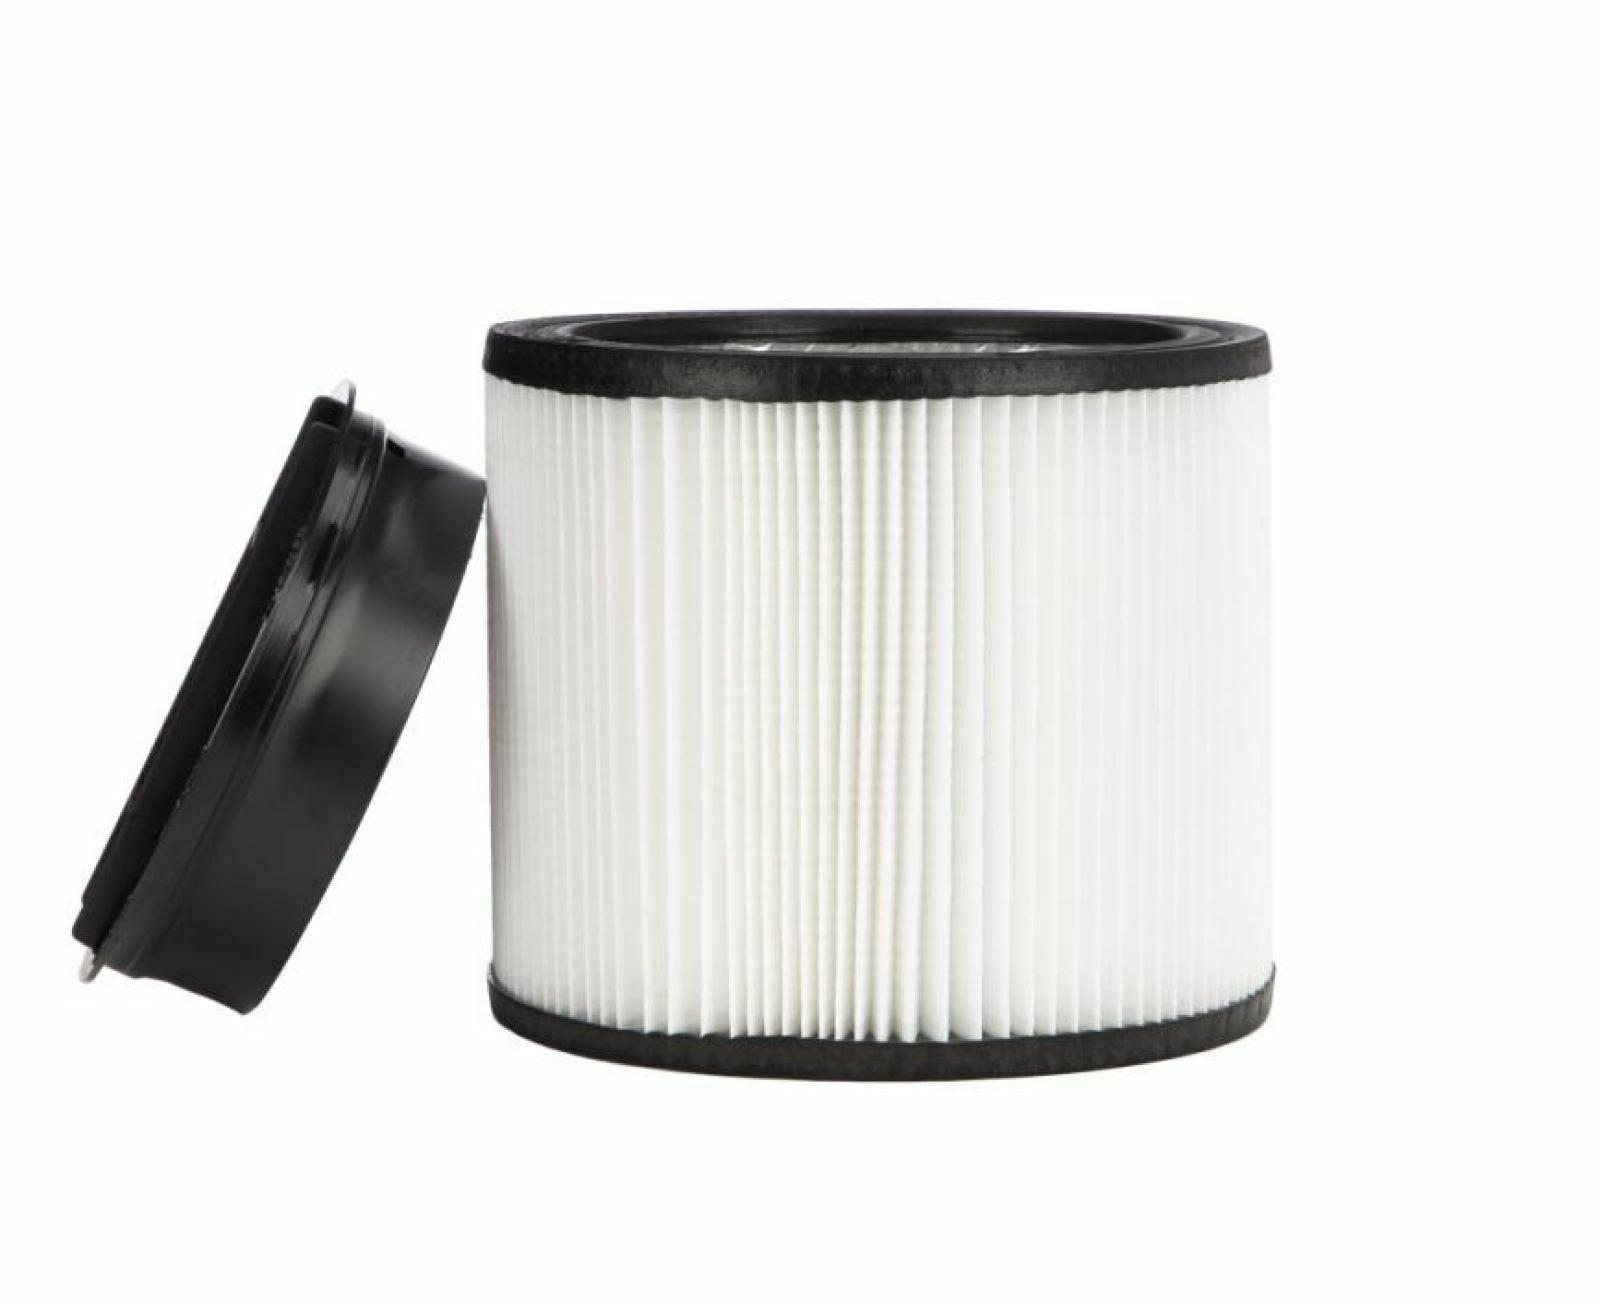 Shop-Vac 5 Gallon Filter Tool